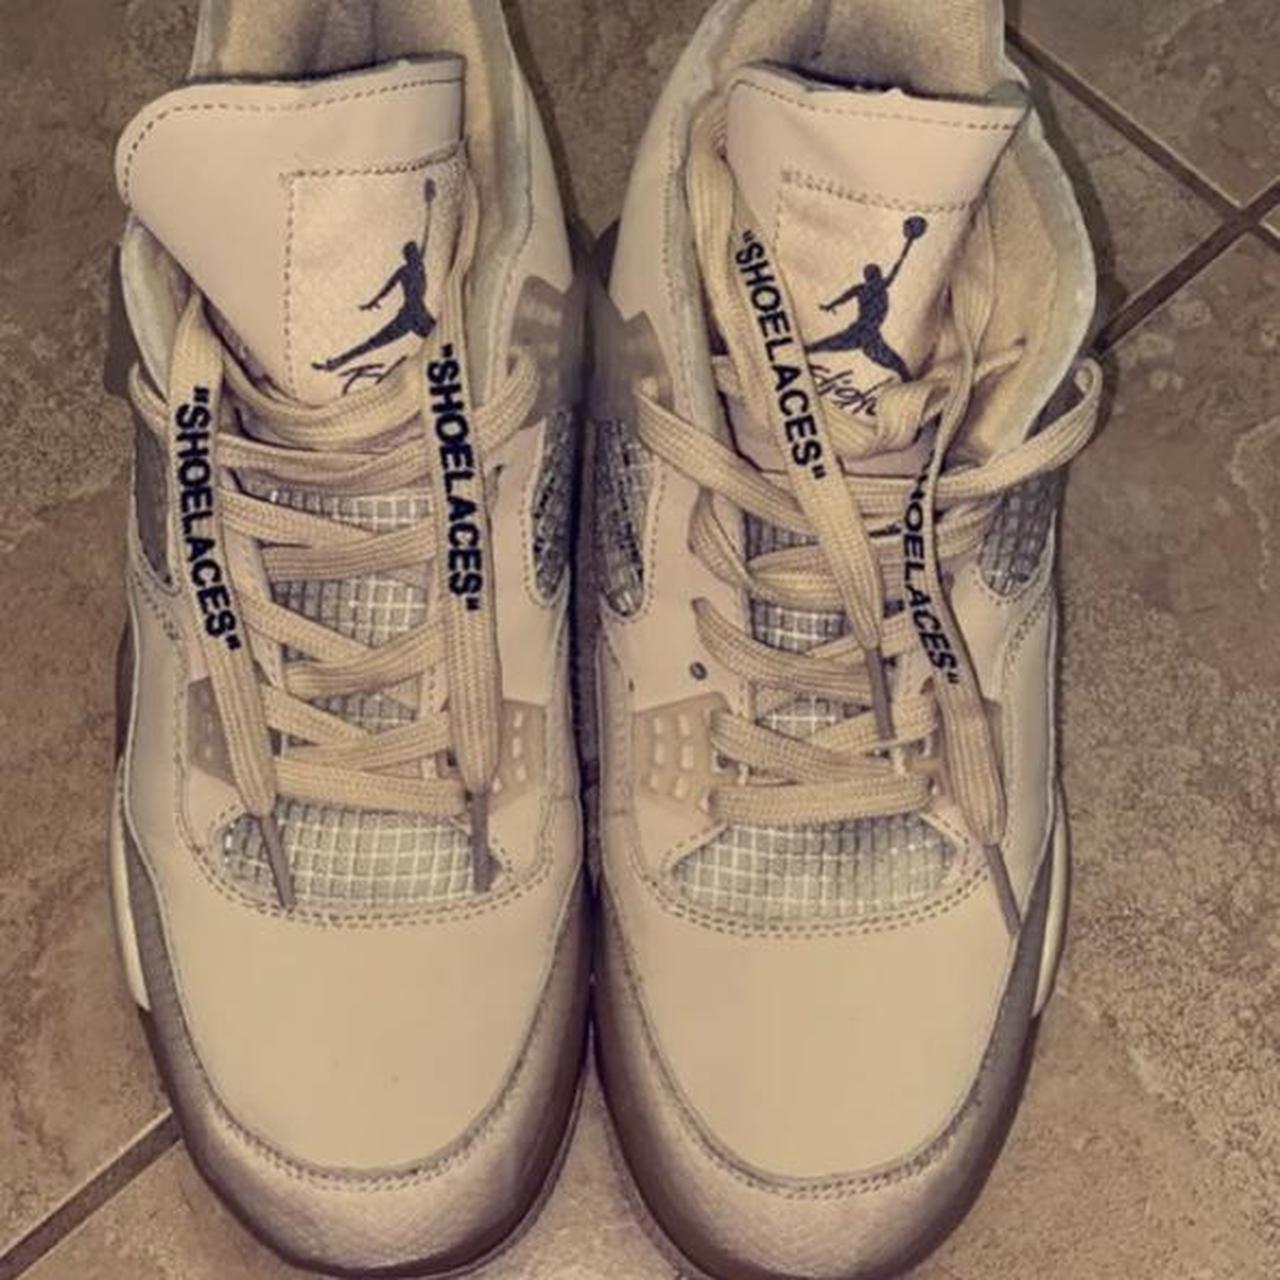 Product Image 1 - Jordan 4 off white sail,